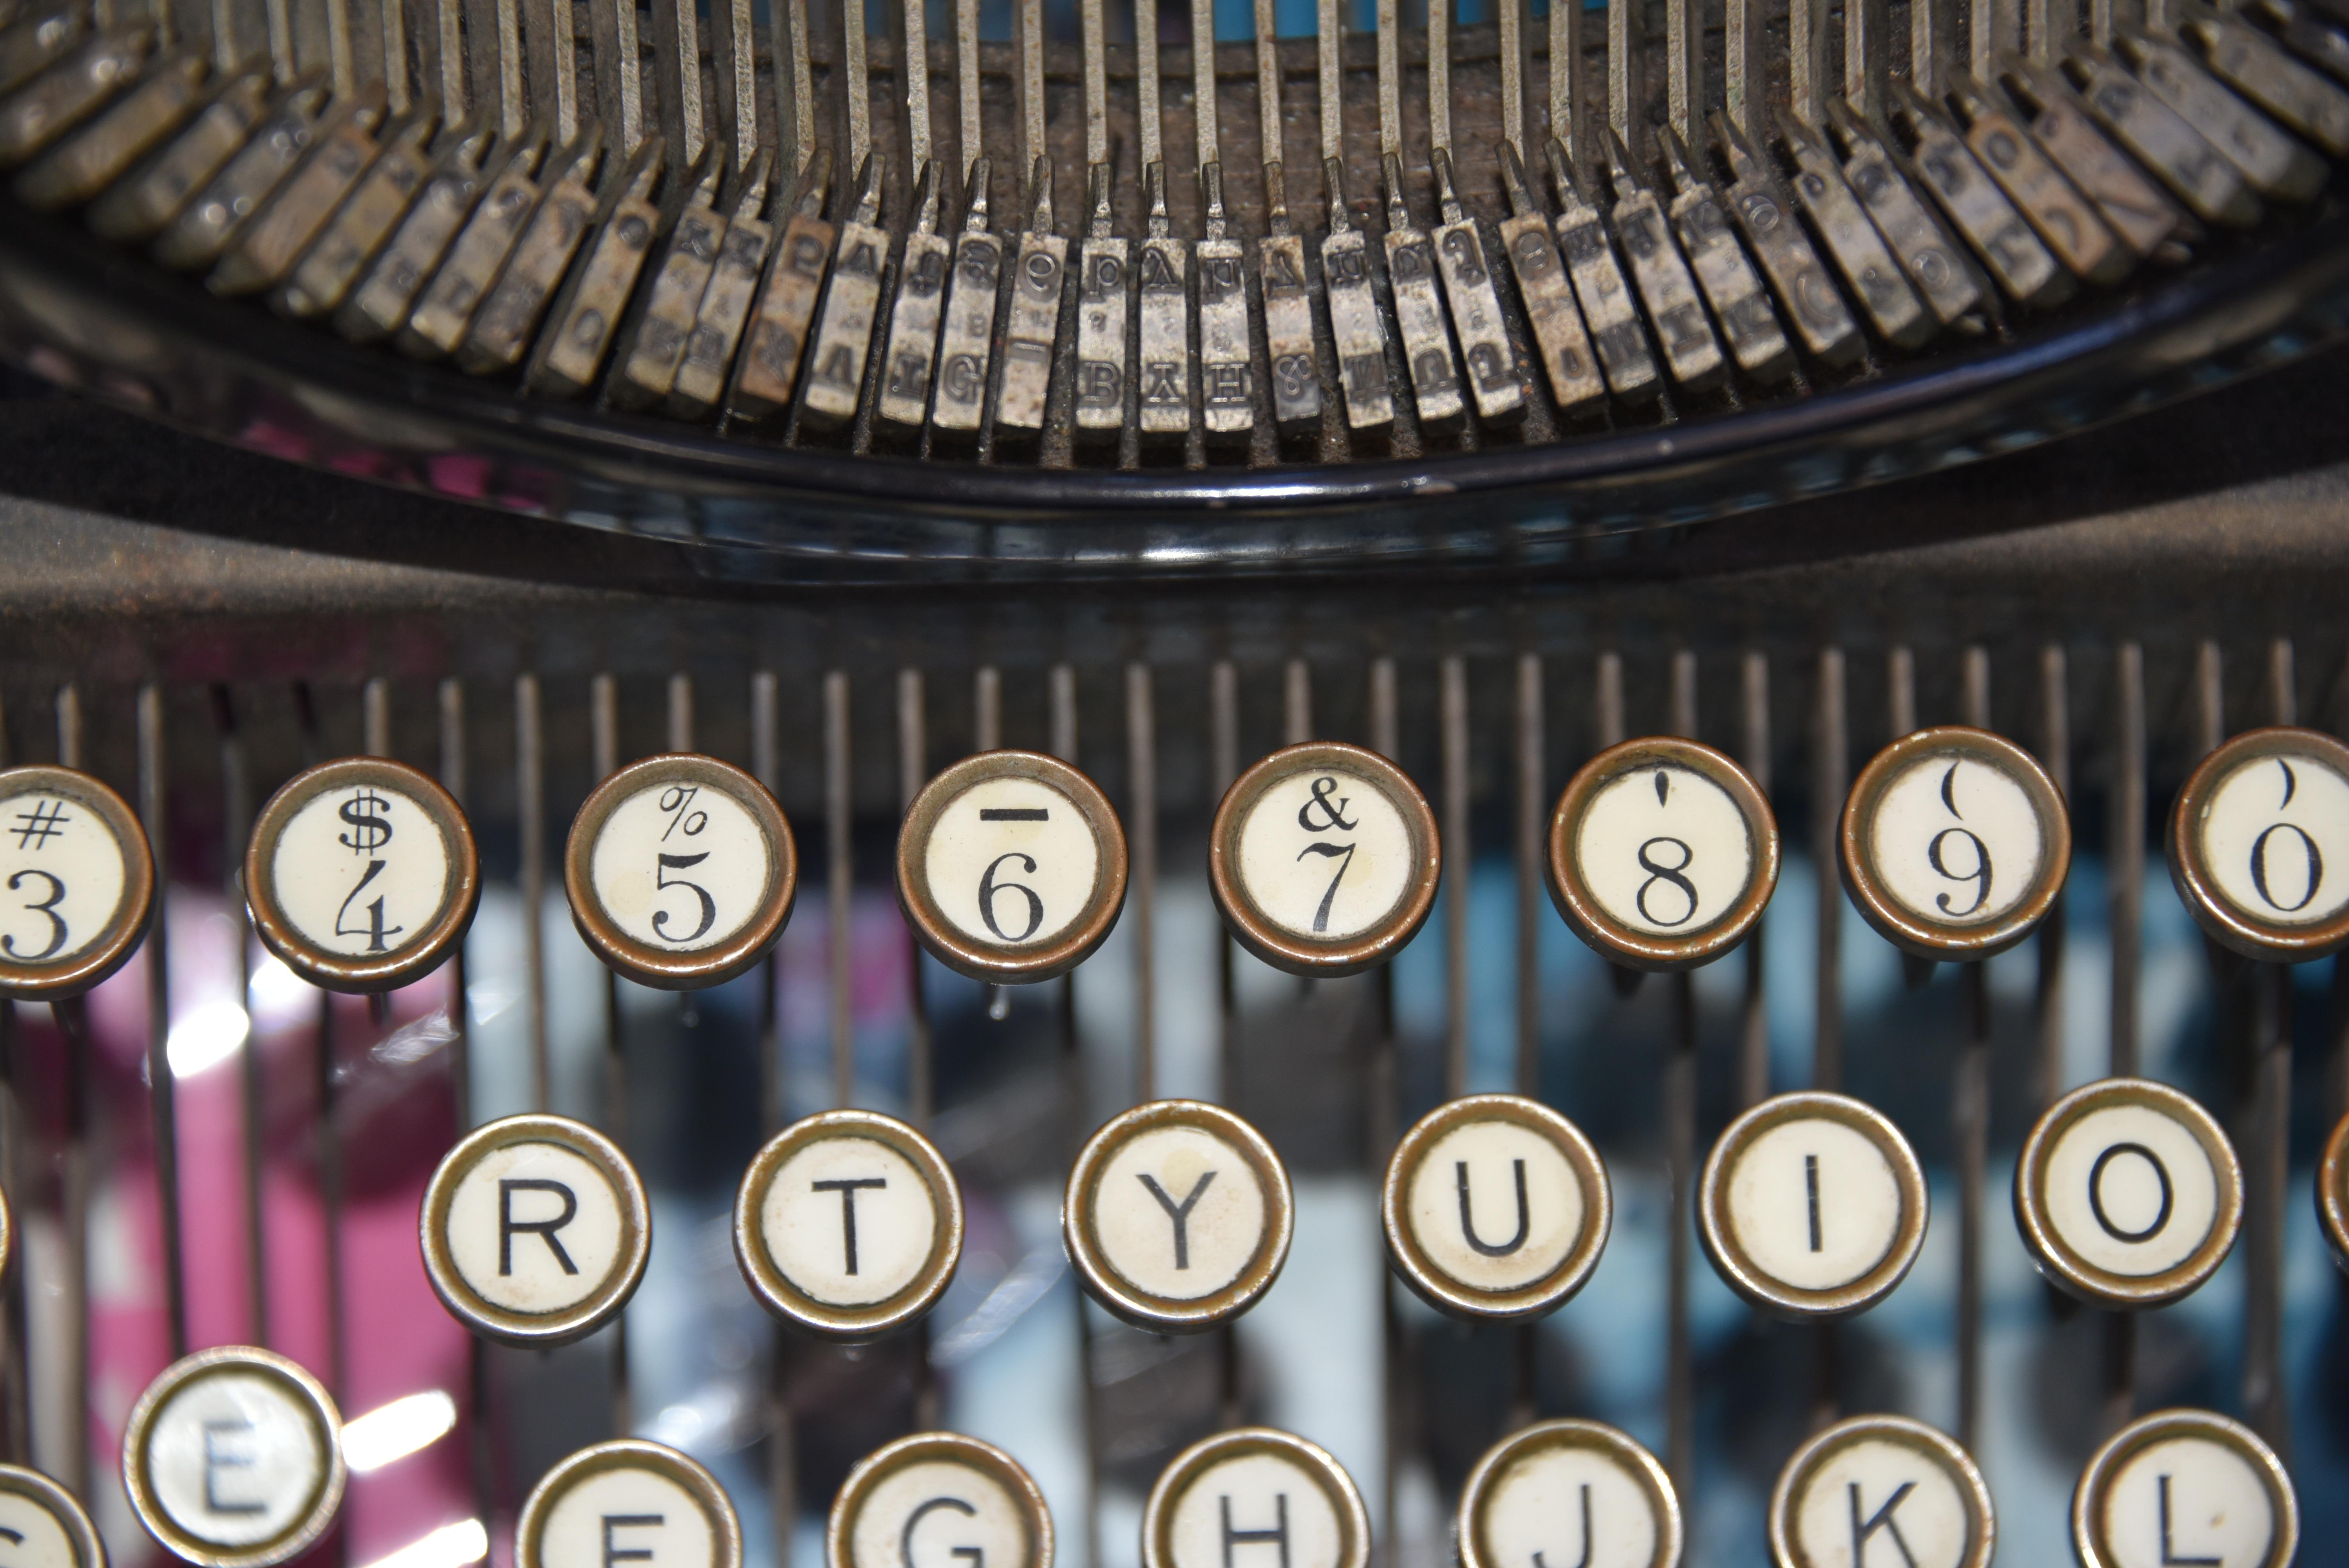 Typing Vintage Antique Typewriter Equipment Key Office Machine Business  Type Keys Office Equipment Qwert